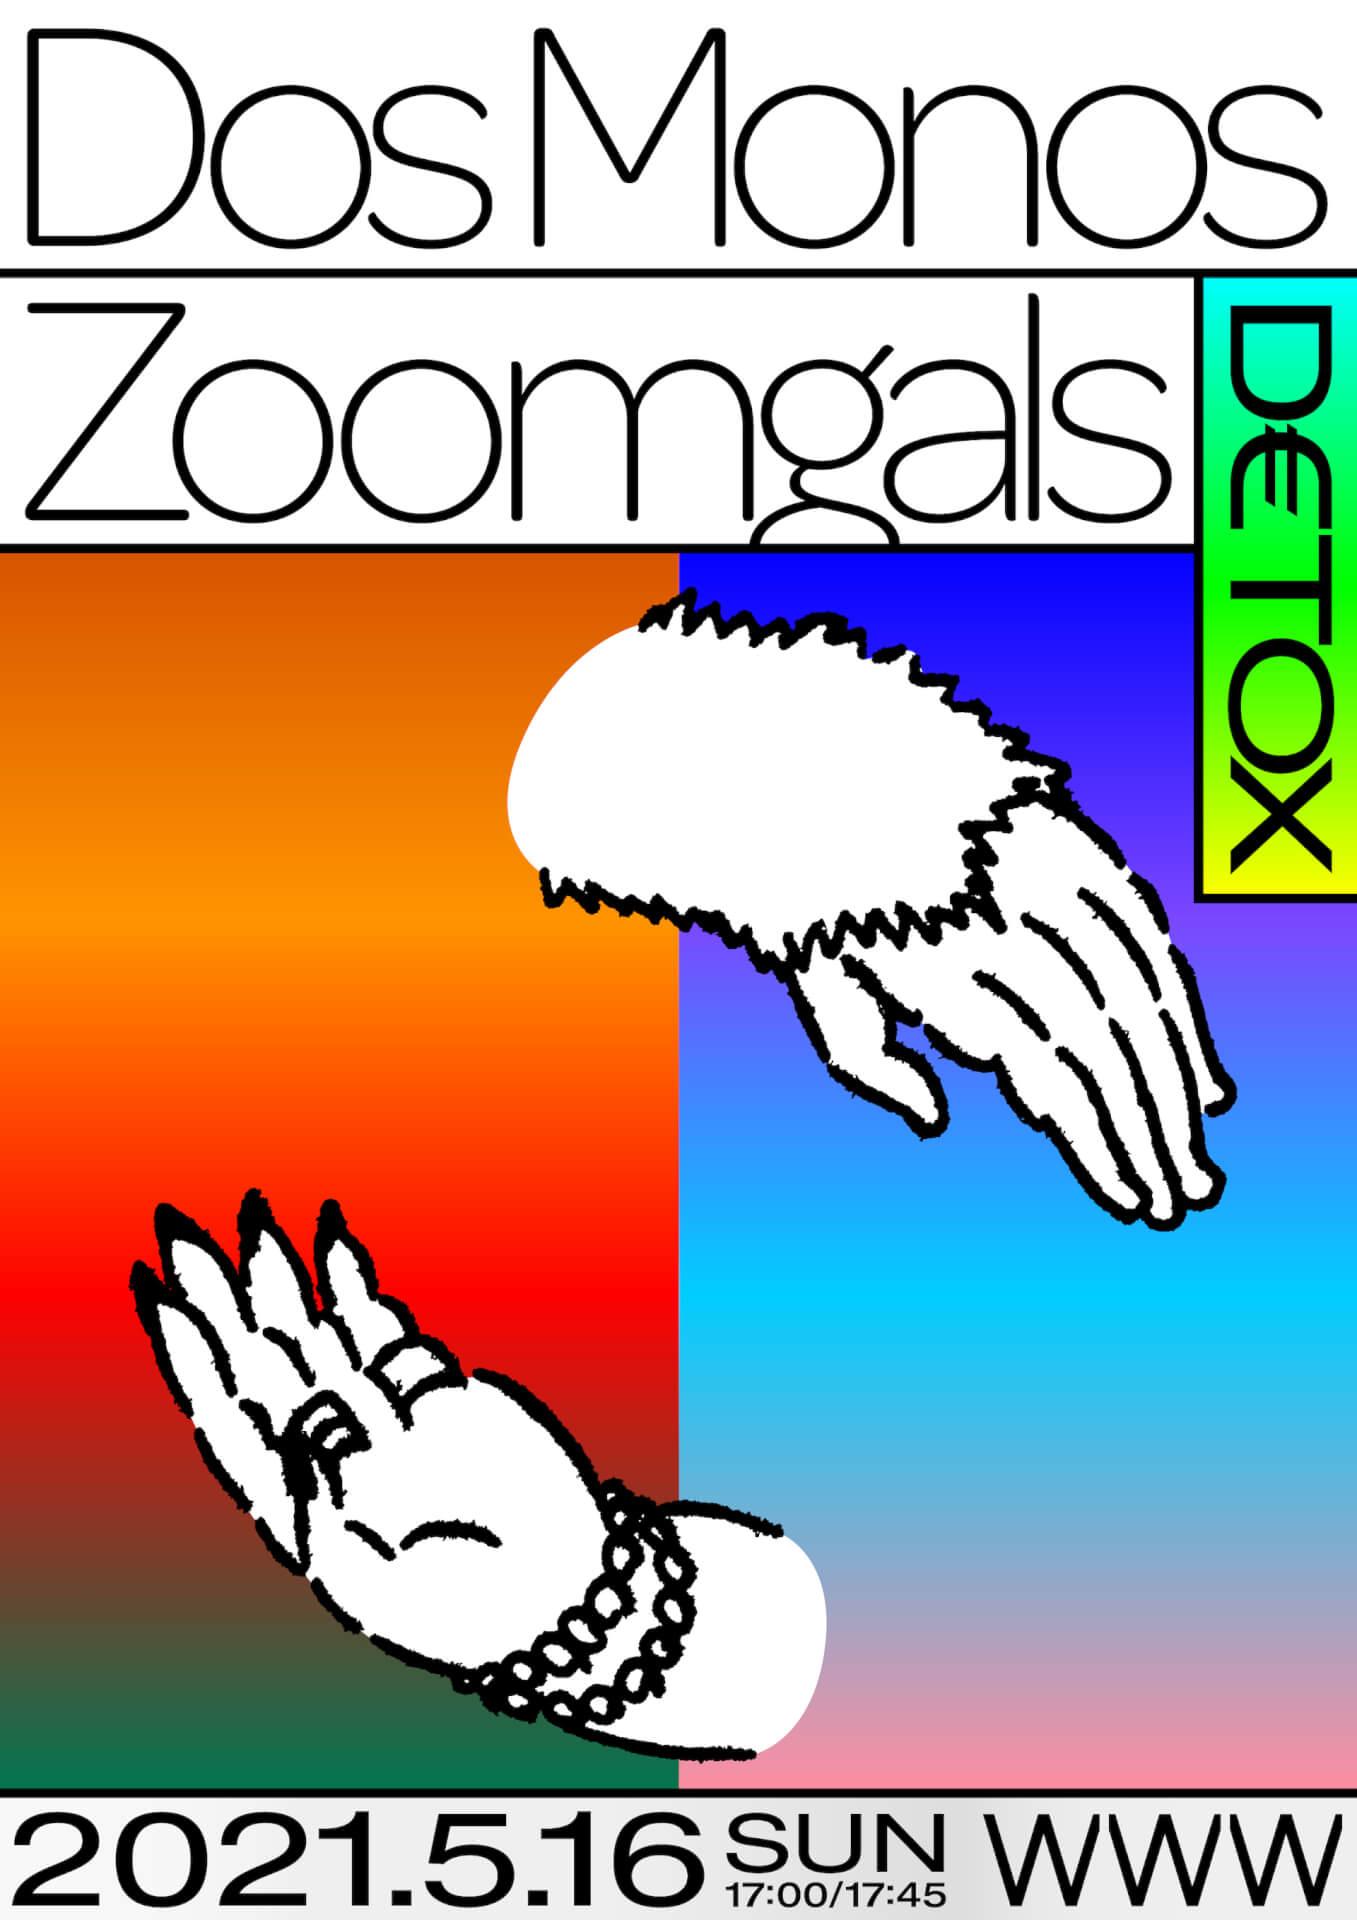 Dos MonosとZoomgalsによる異色コラボが実現!<D€TOX>が渋谷WWWで開催決定 music210413_dosmonos_zoomgals_1